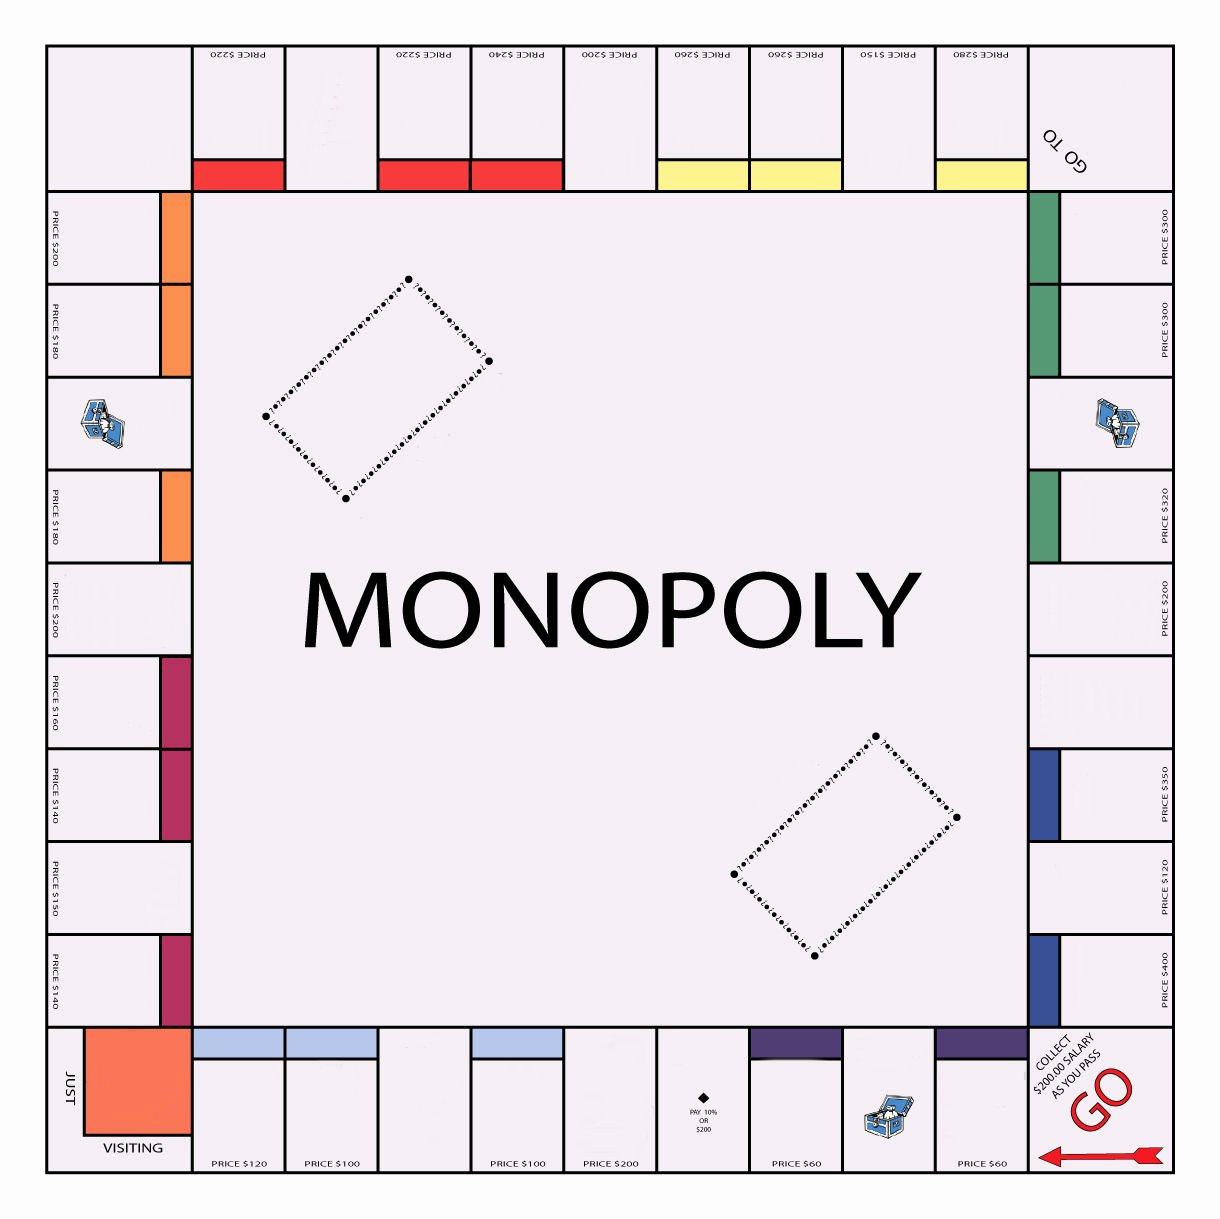 Blank Monopoly Board Awesome Economic Development News for Sun Prairie Wisconsin